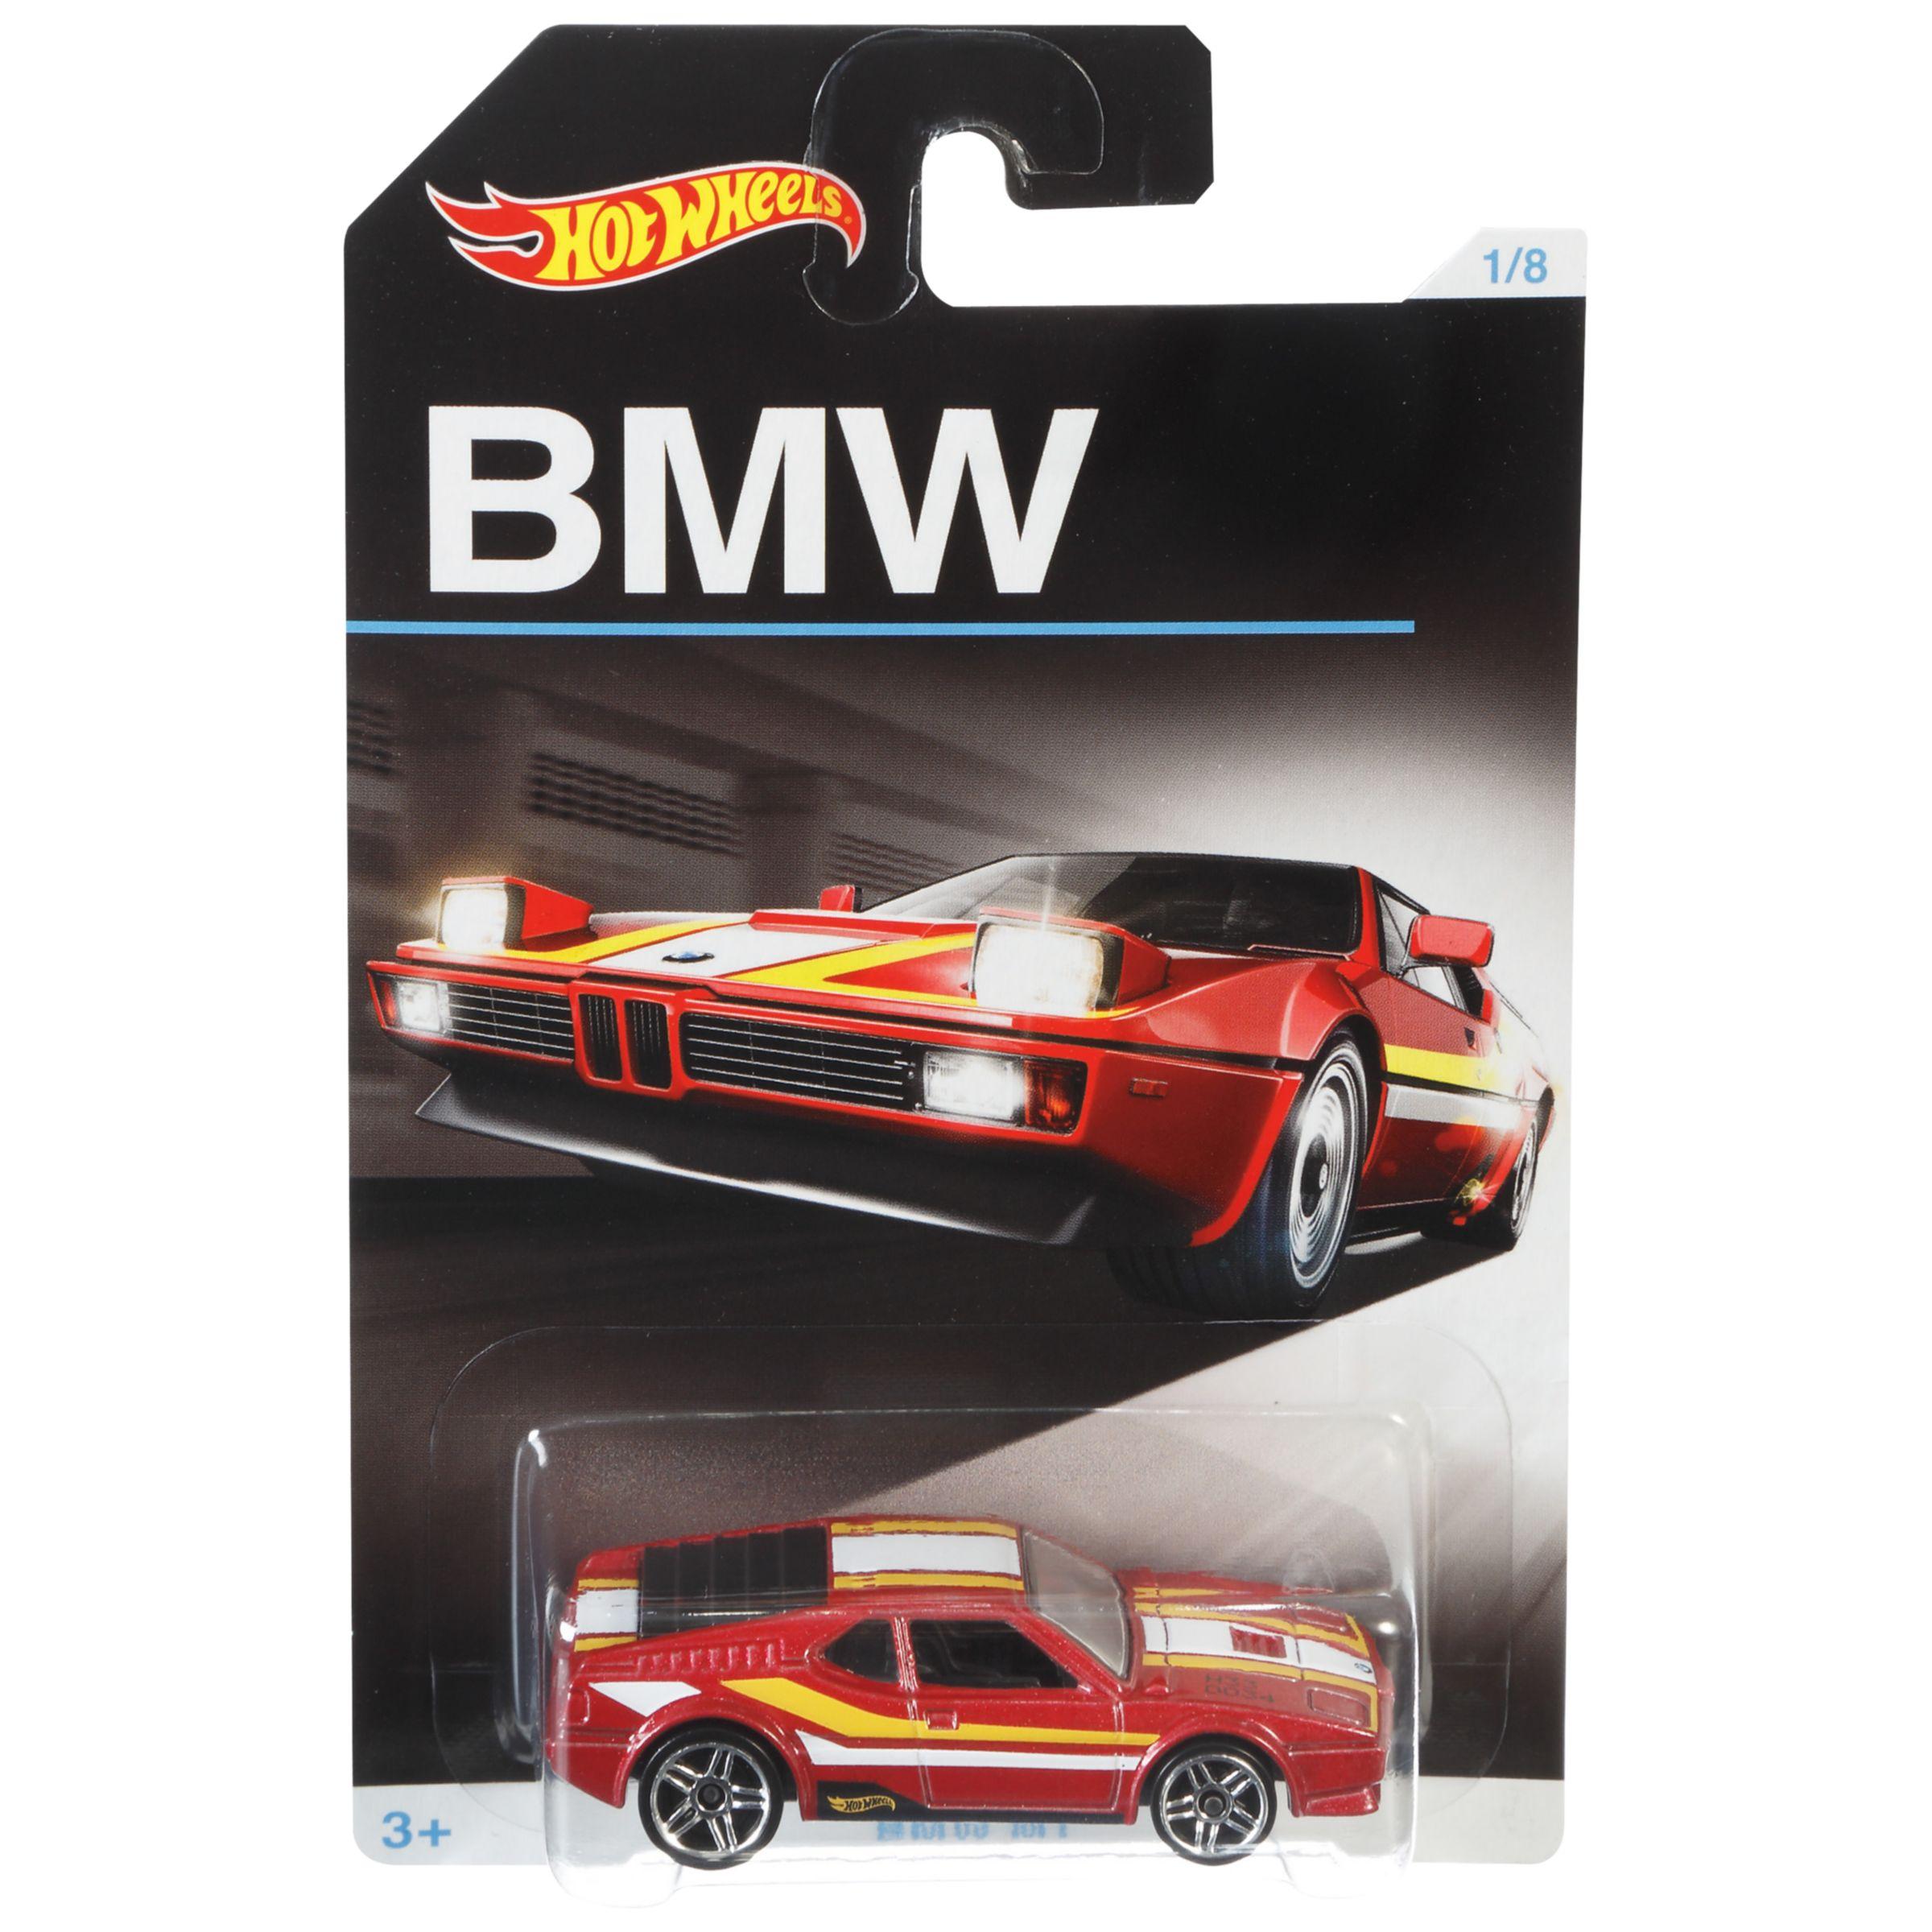 Hot Wheels Hot Wheels BMW Anniversary, Assorted